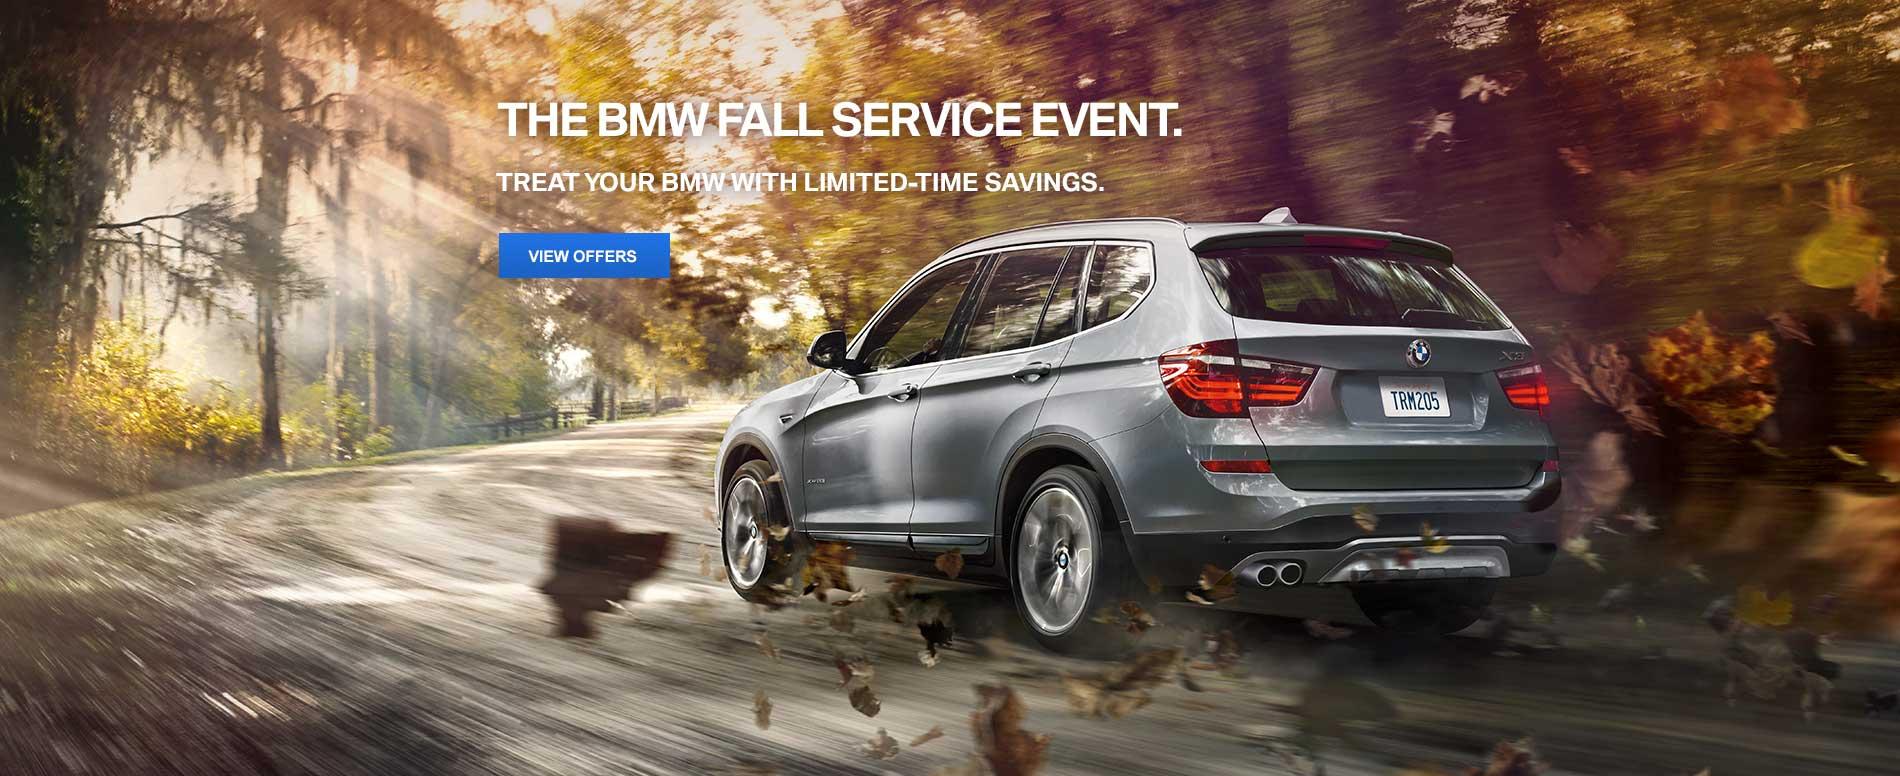 Worksheet. Union Park BMW  Wilmington BMW Dealer  Large Selection of BMW Cars